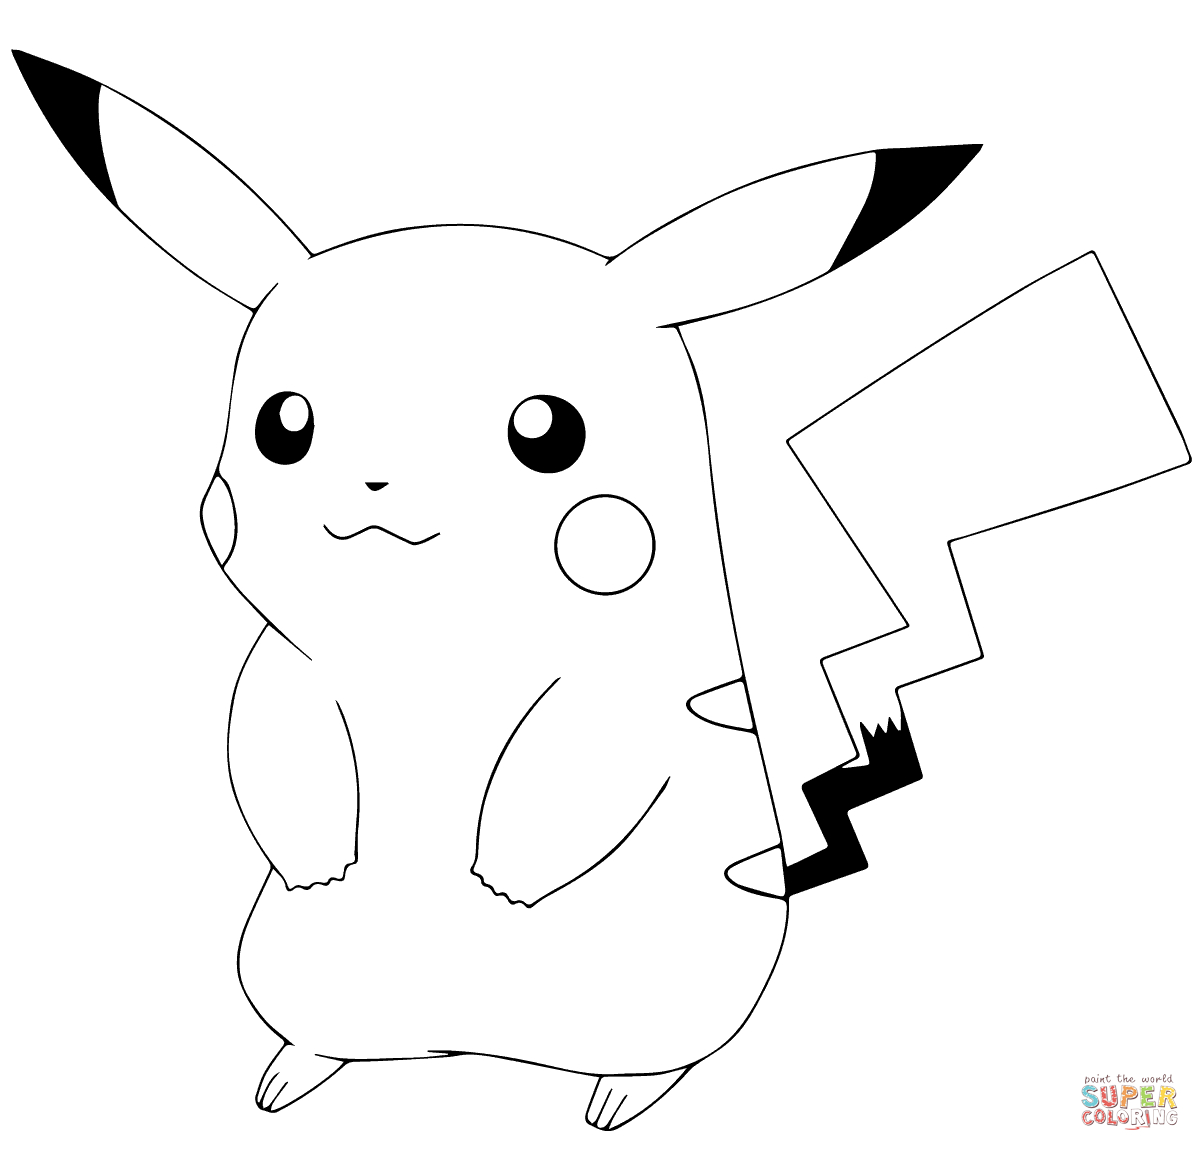 Pokémon Go Pikachu Coloring Page | Free Printable Coloring Pages - Free Printable Pokemon Coloring Pages